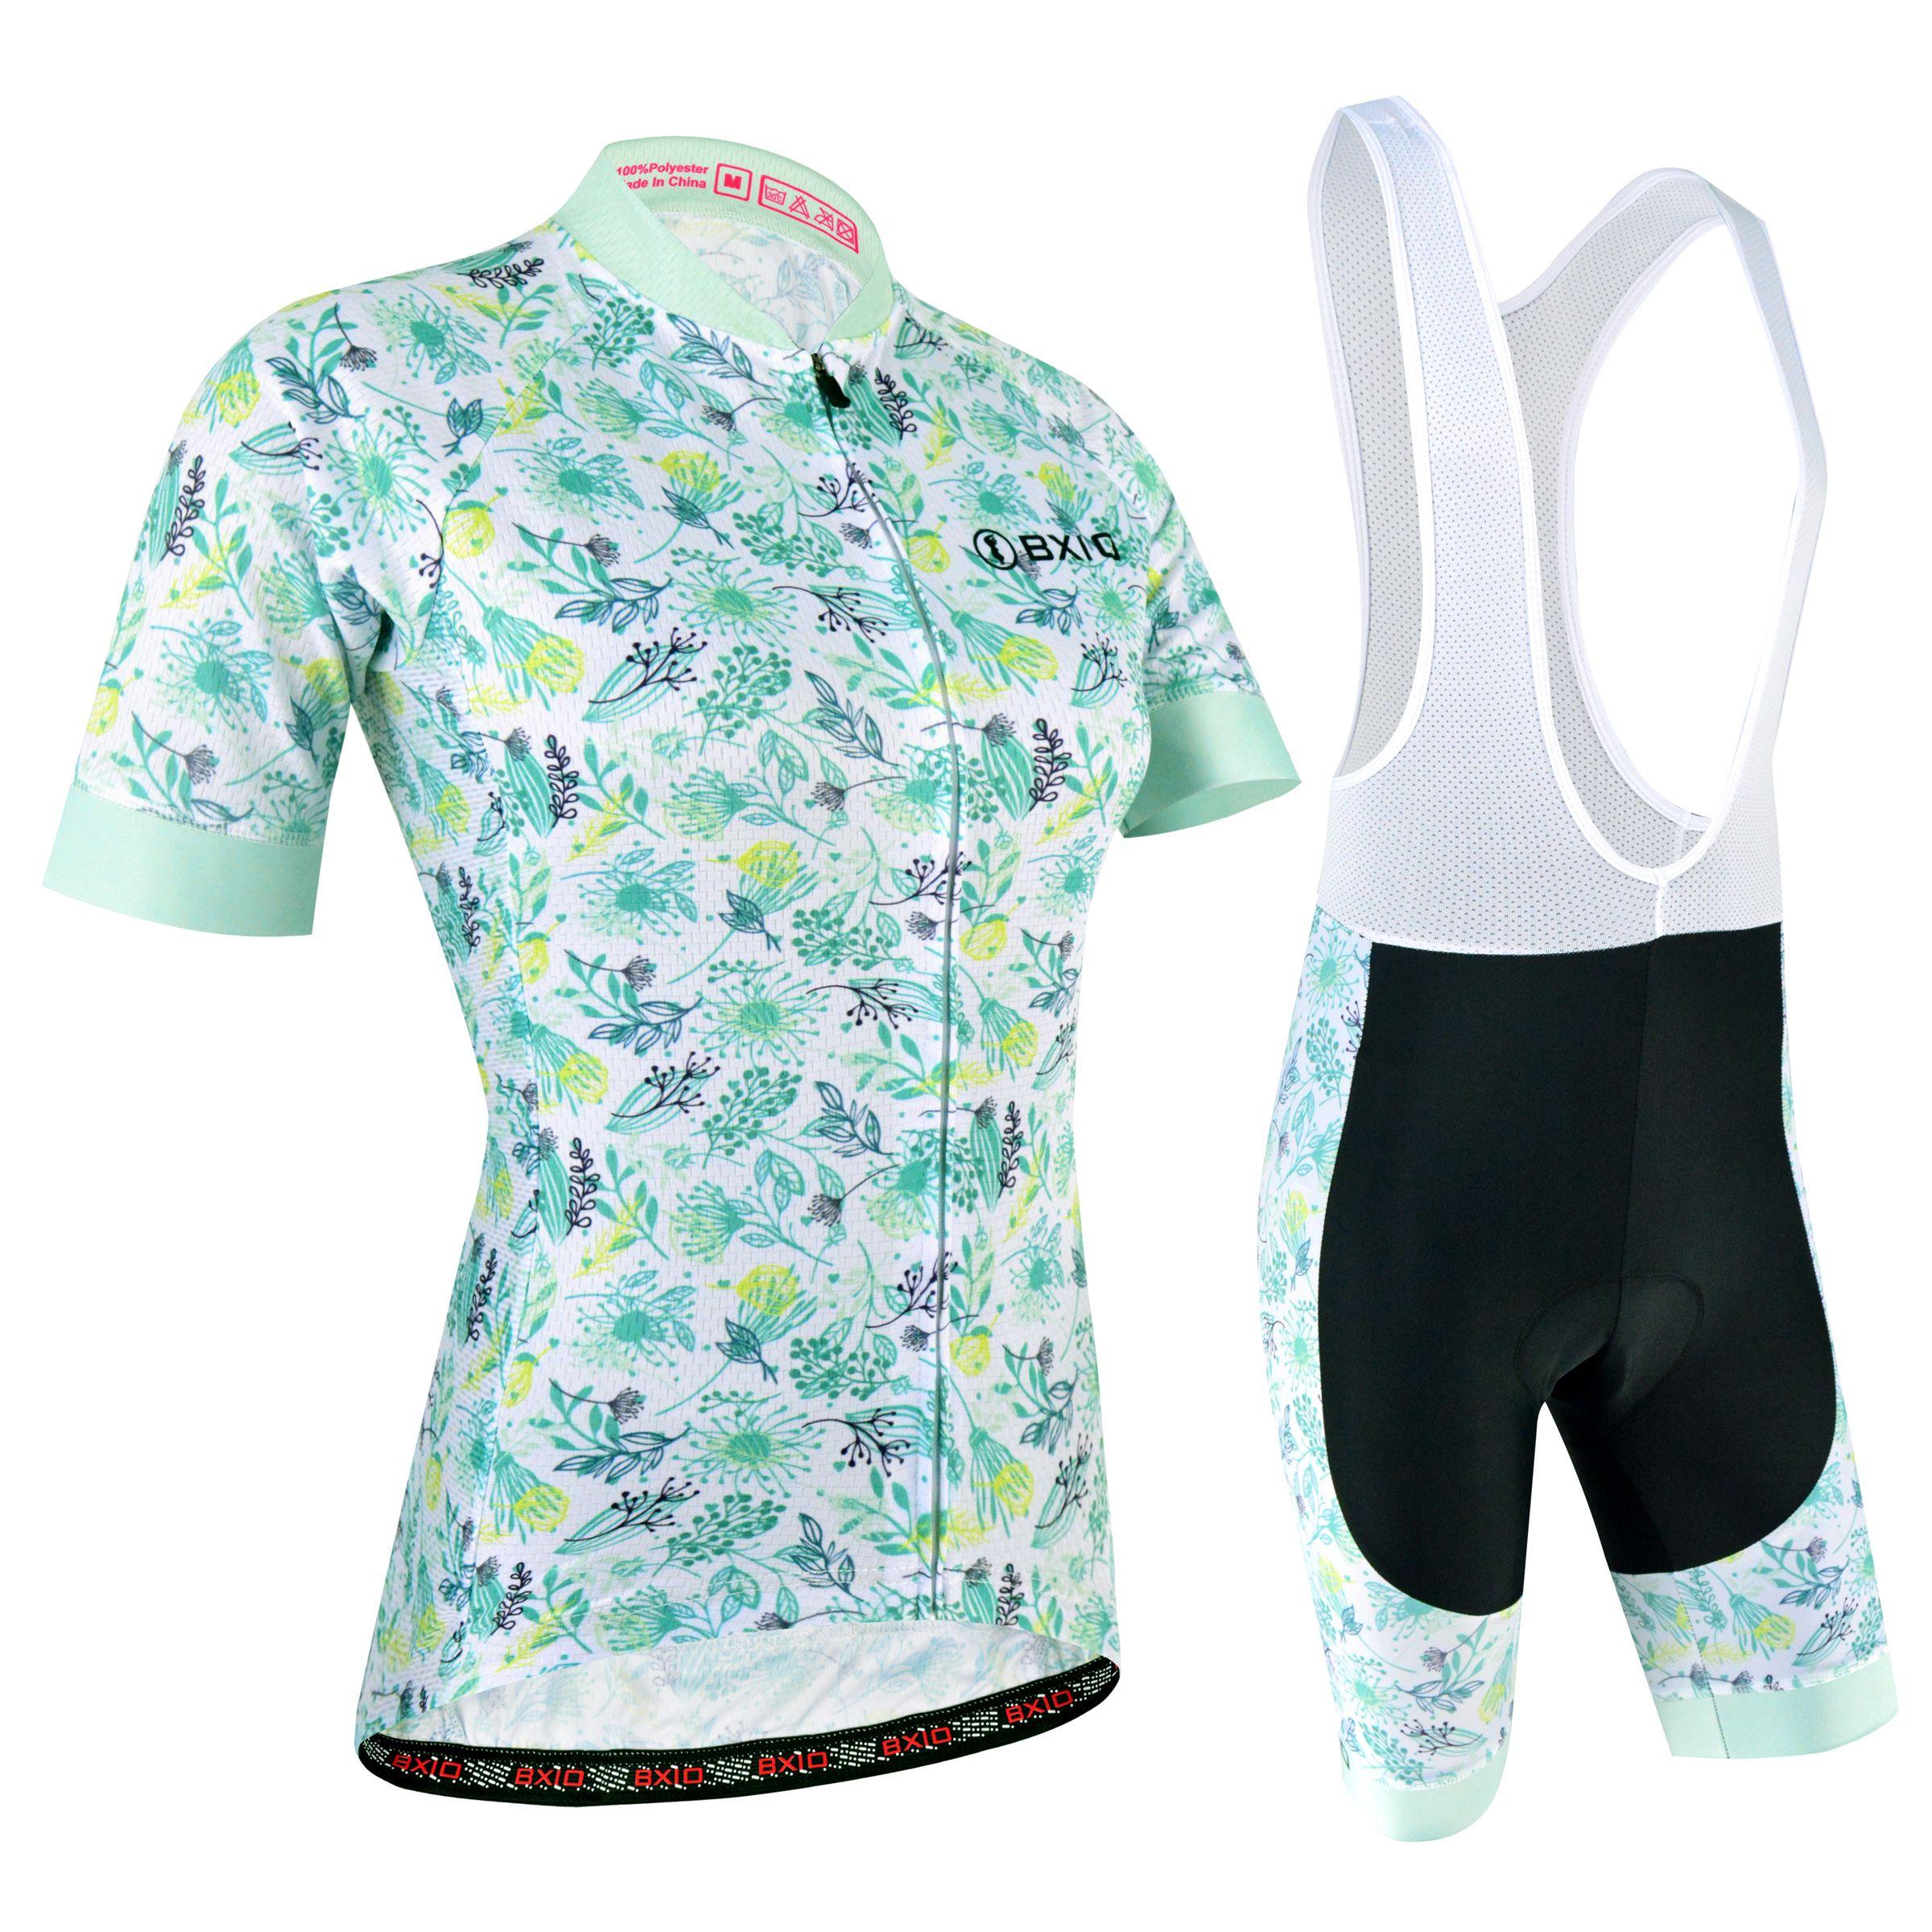 2018 BXIO Brand Women Cycling Clothing Summer Short Sleeve Cycling ... 991ebbf19